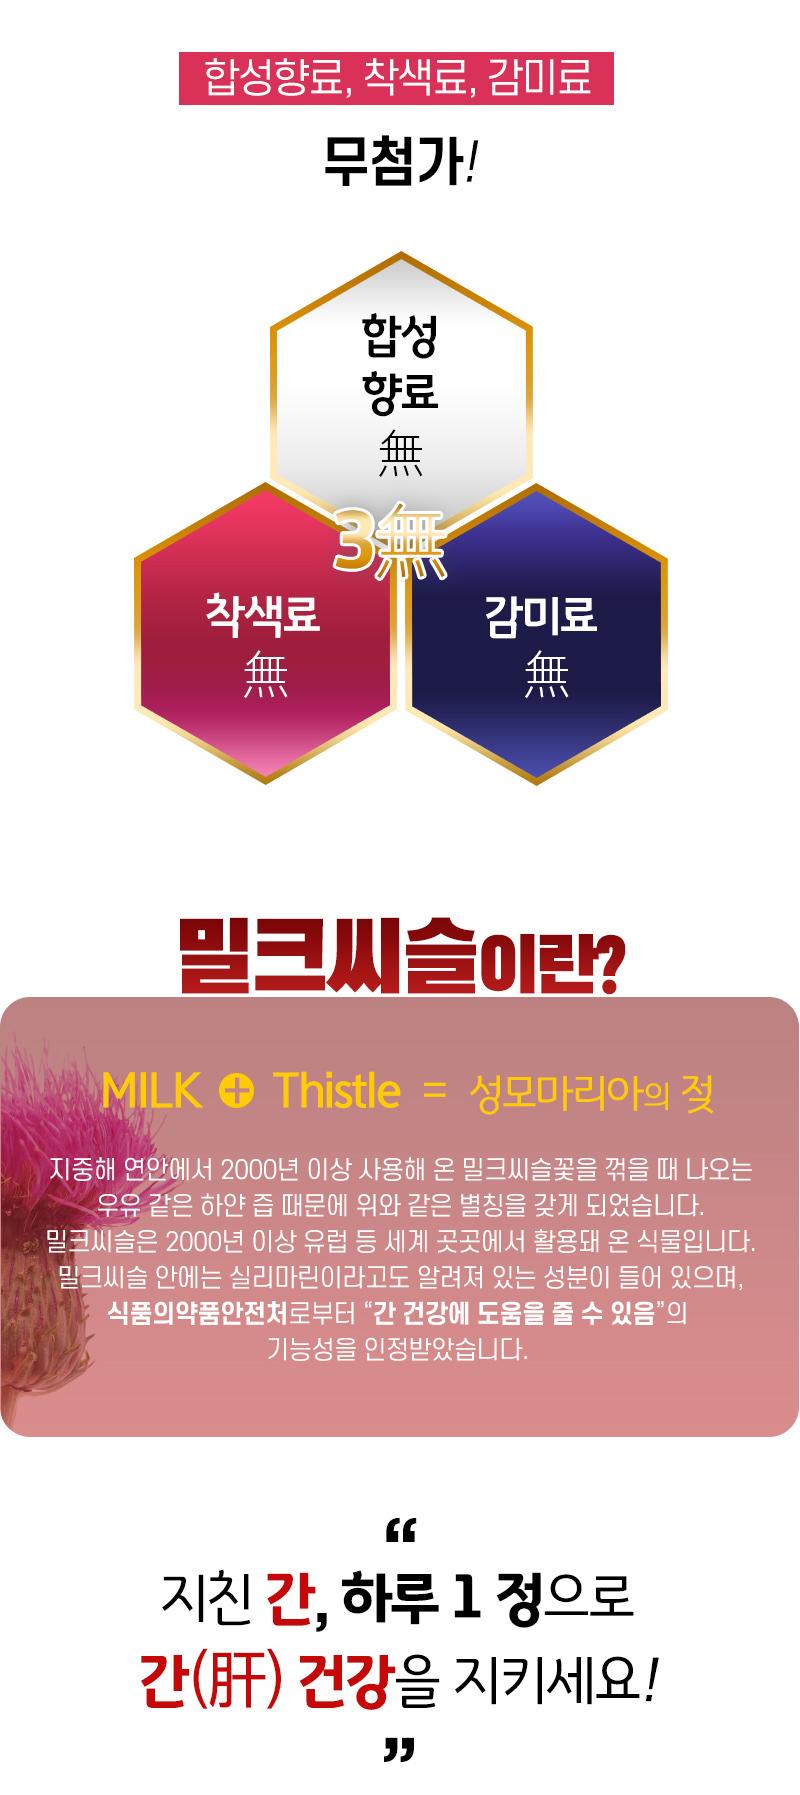 milkthistle_detail_03.jpg